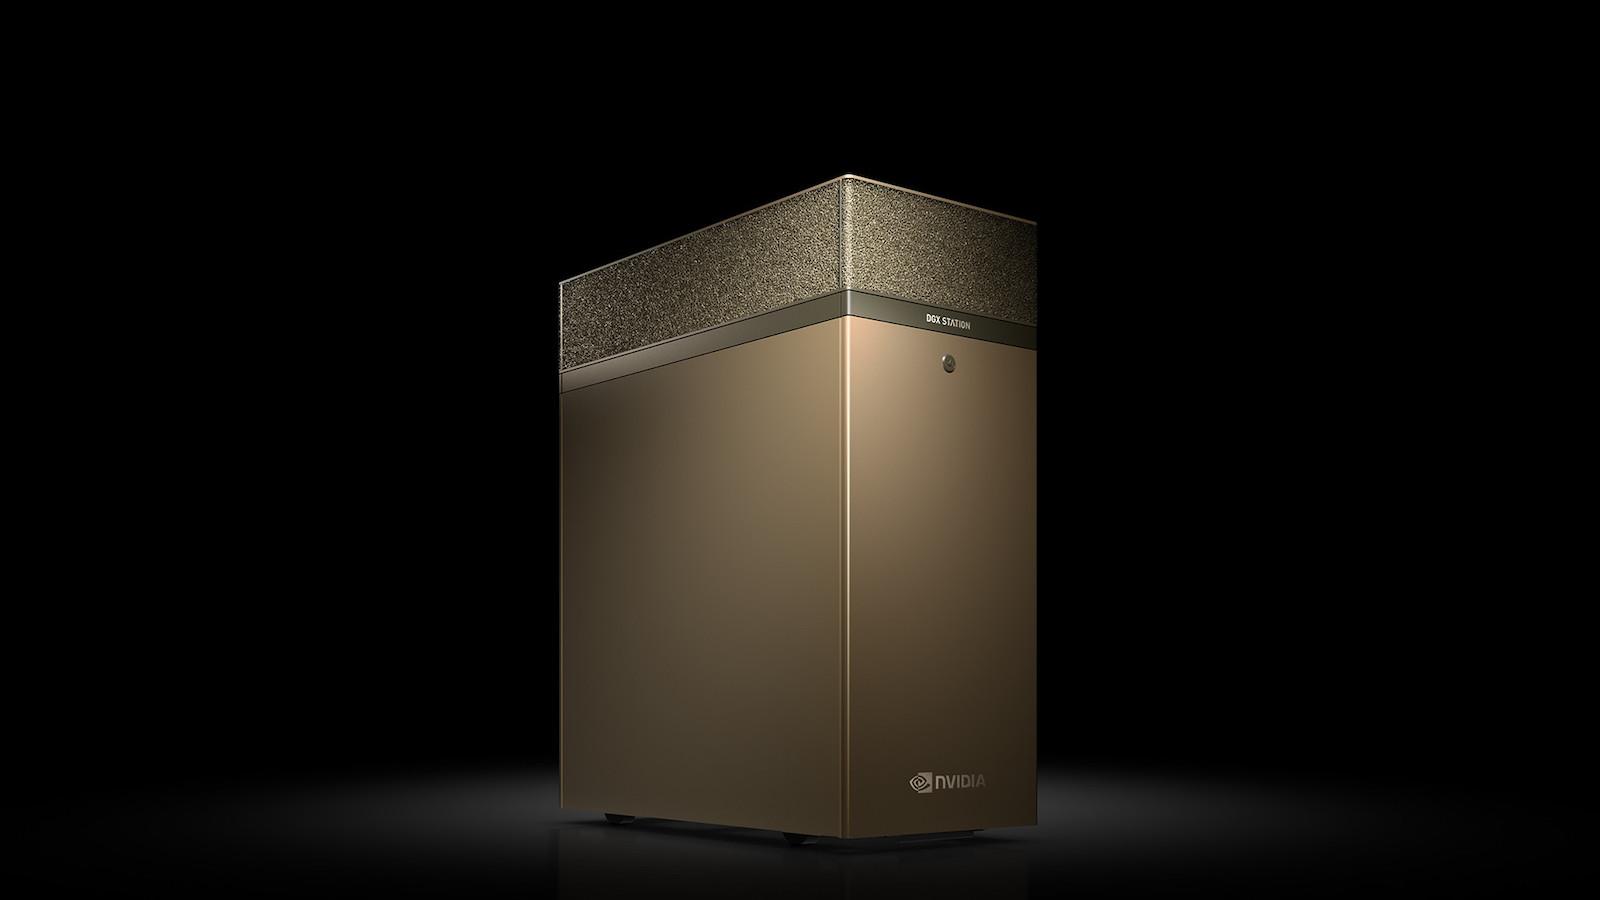 NVIDIA DGX STATION A100 desktop workstation comes with four 80GB GPUs